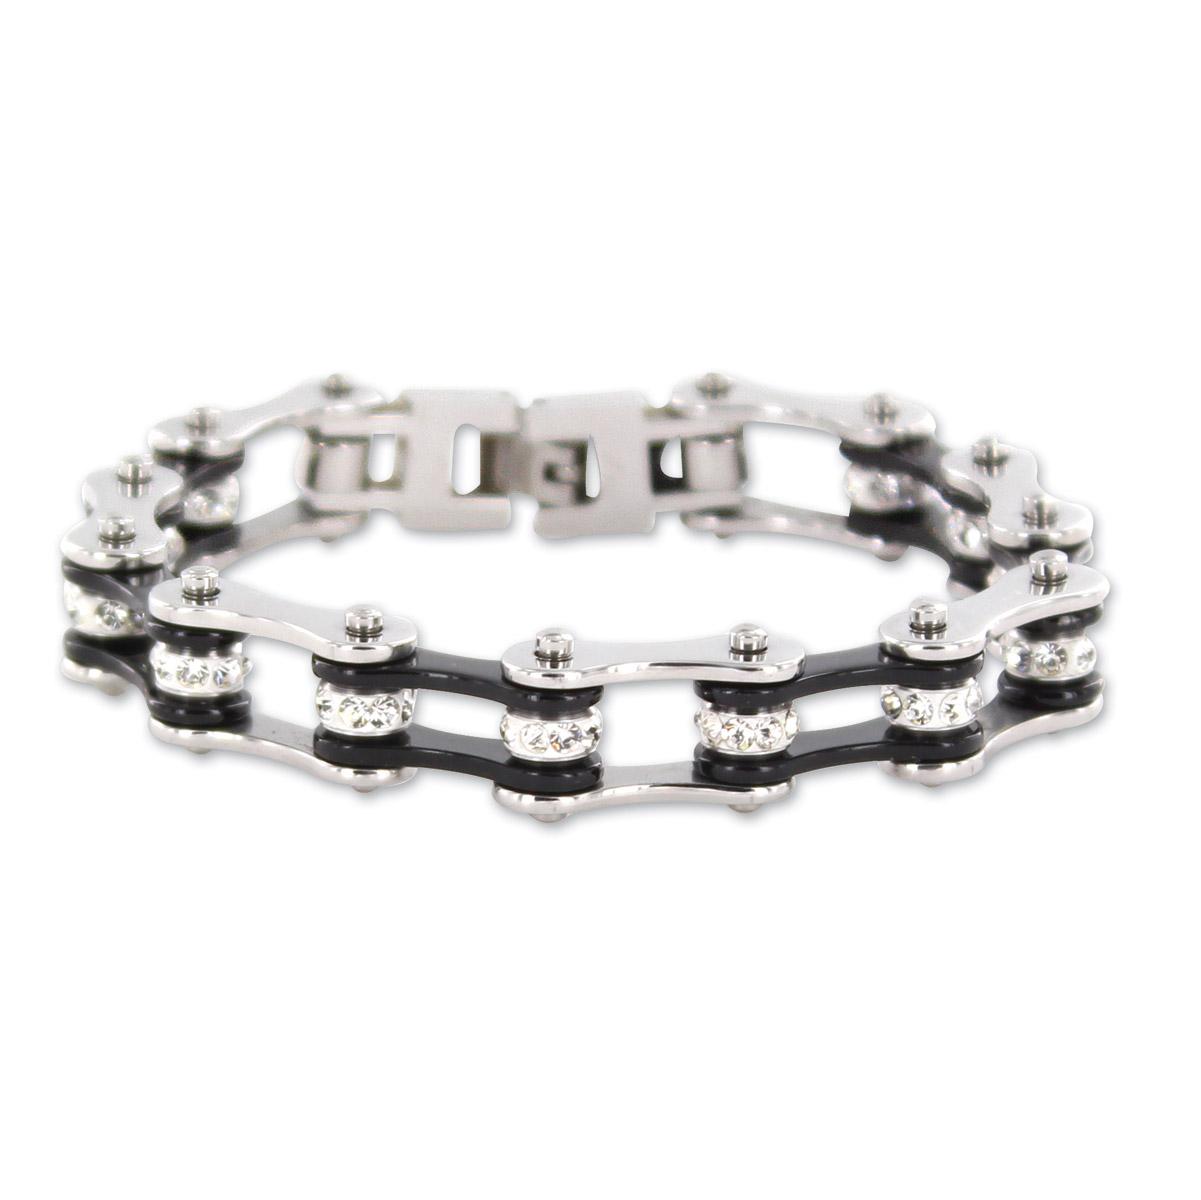 Kodiak Silver/Black with Crystals Chain Bracelet